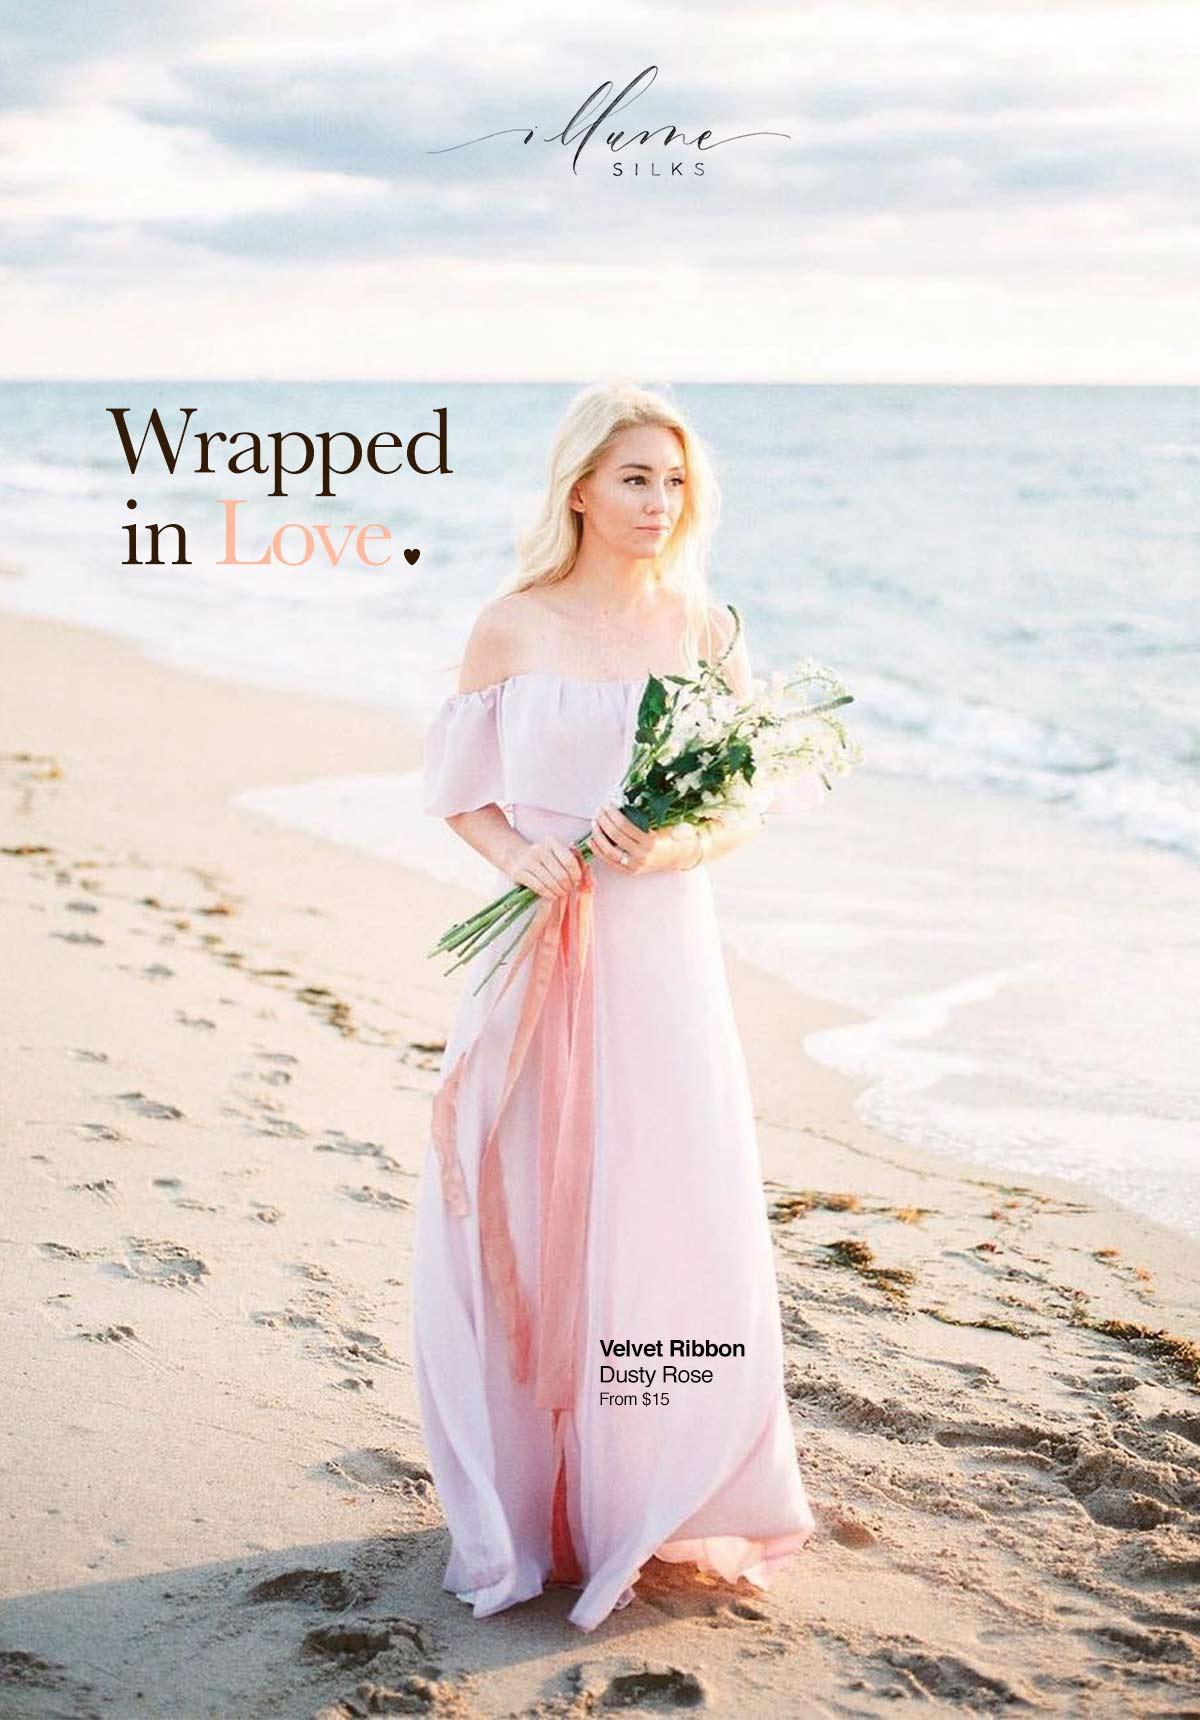 illume silks wrapped in love campaign key art